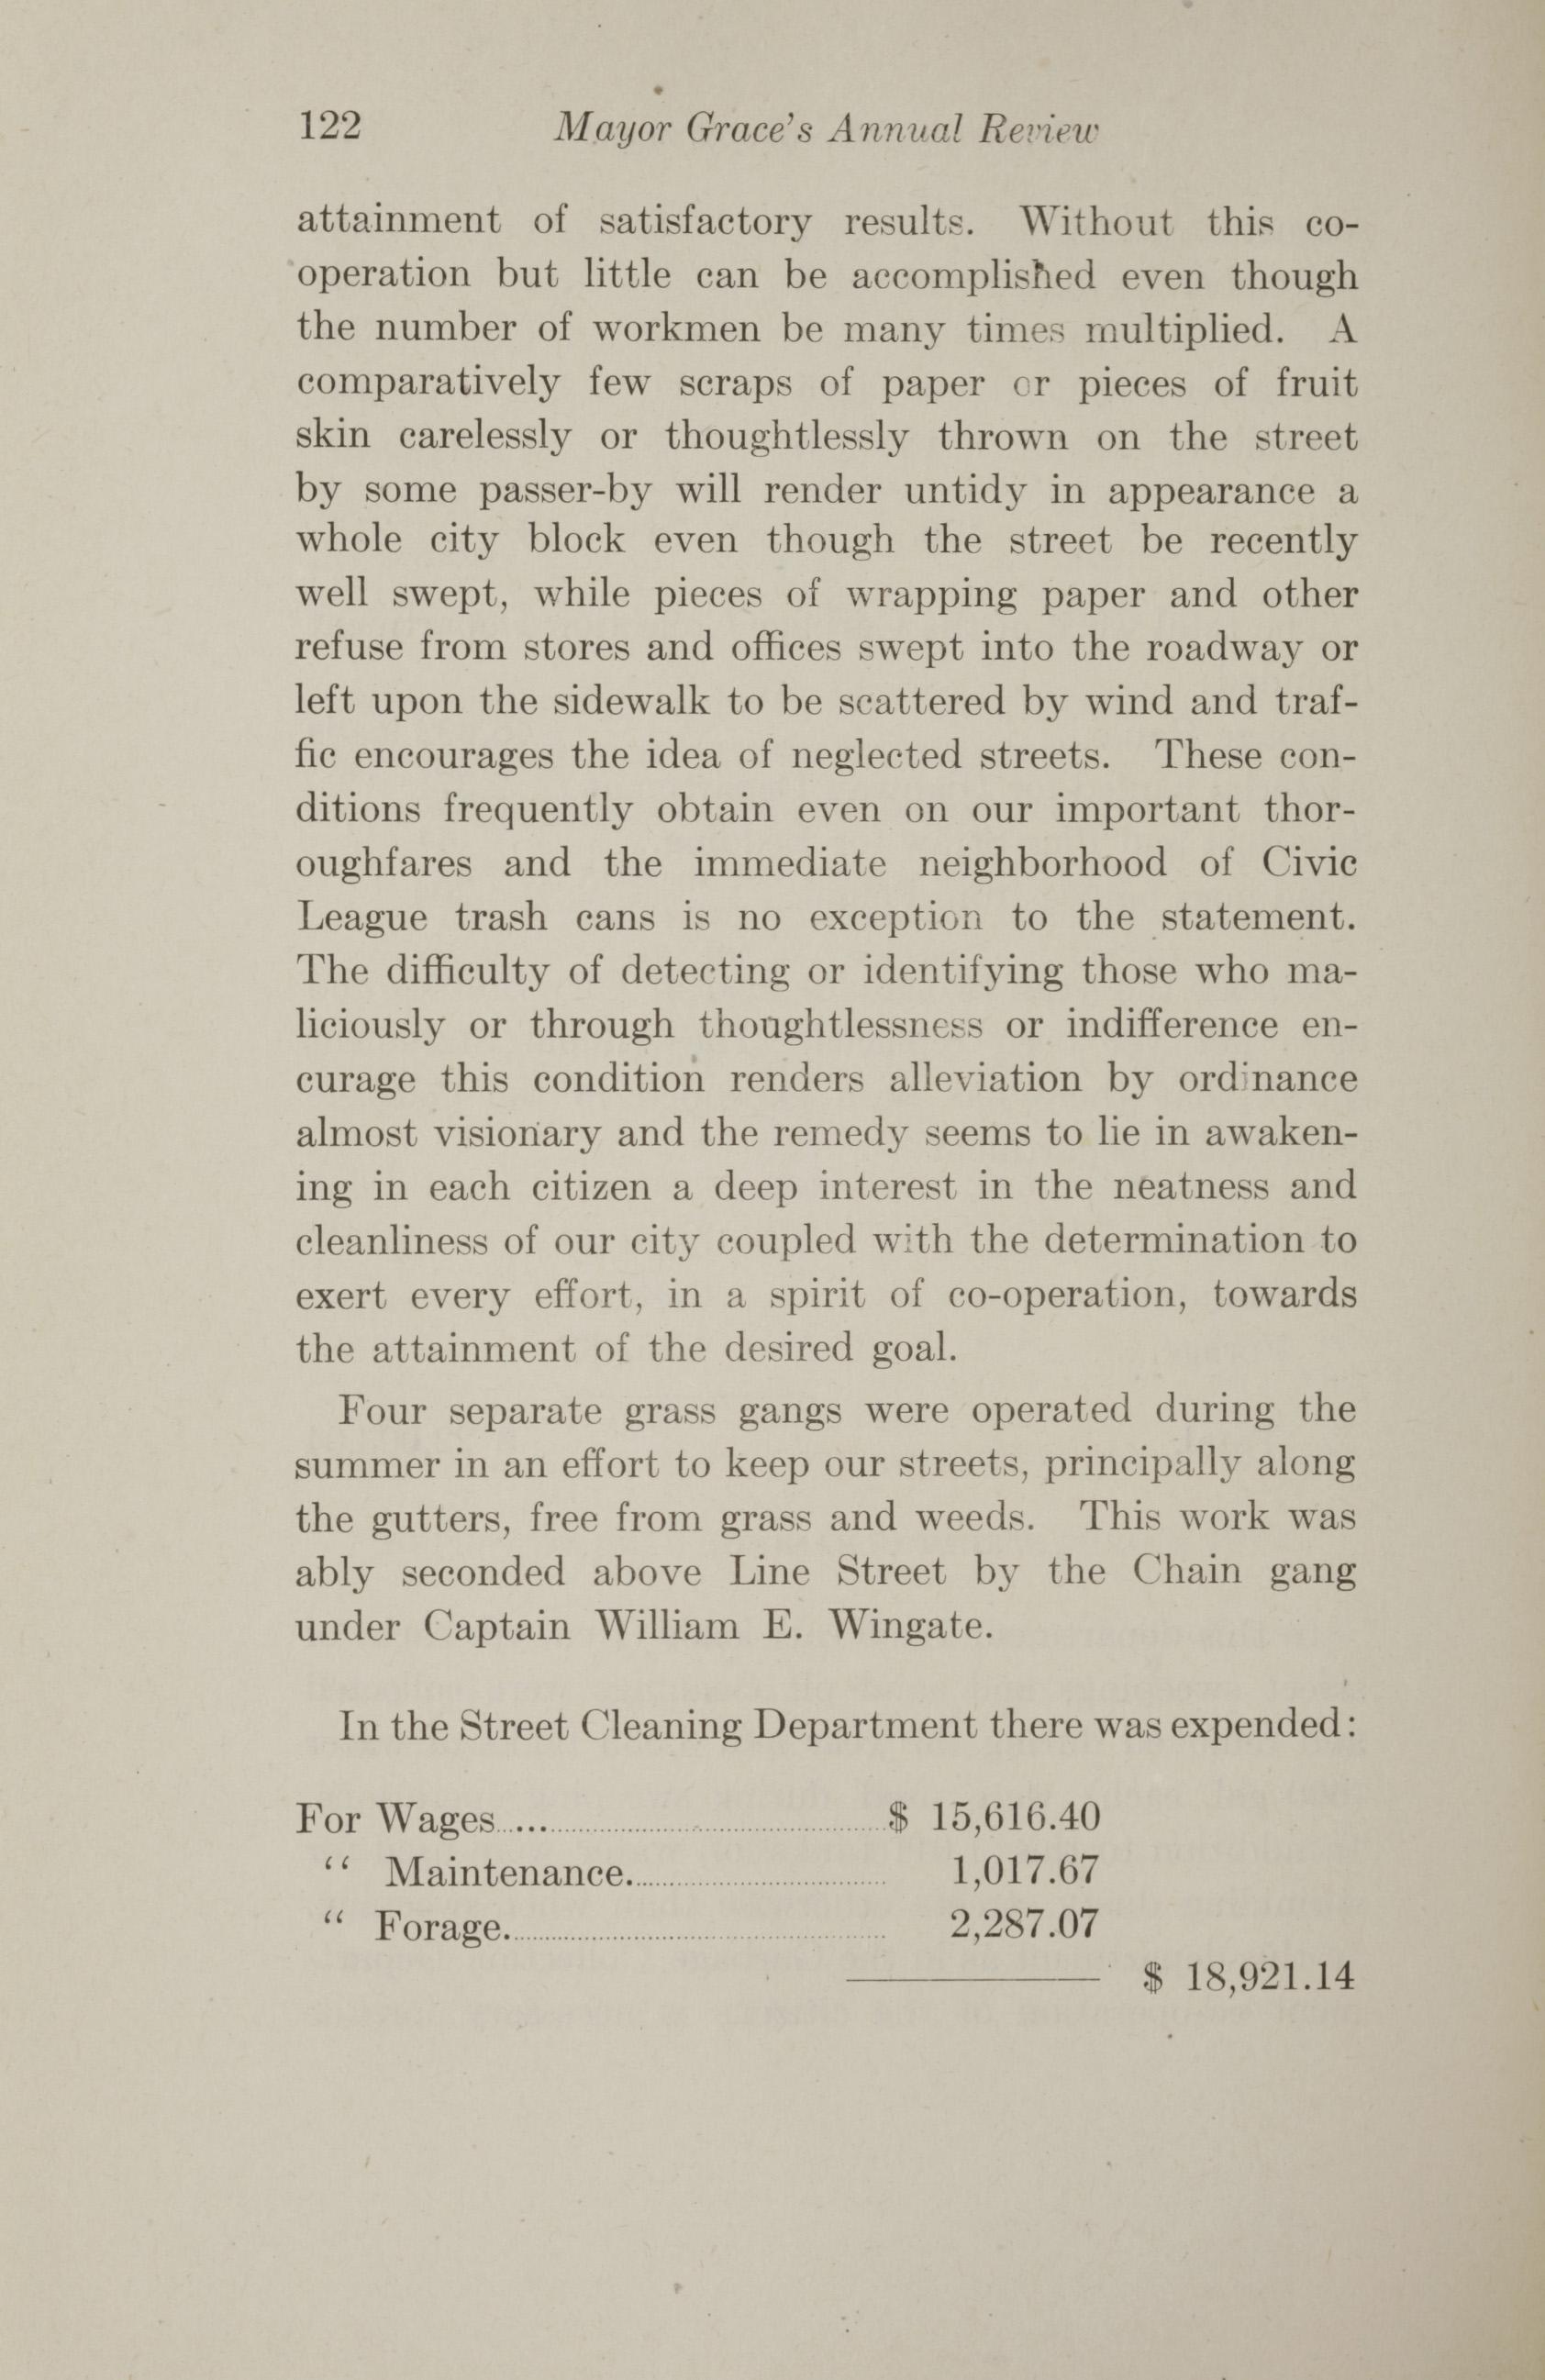 Charleston Yearbook, 1912, page 122